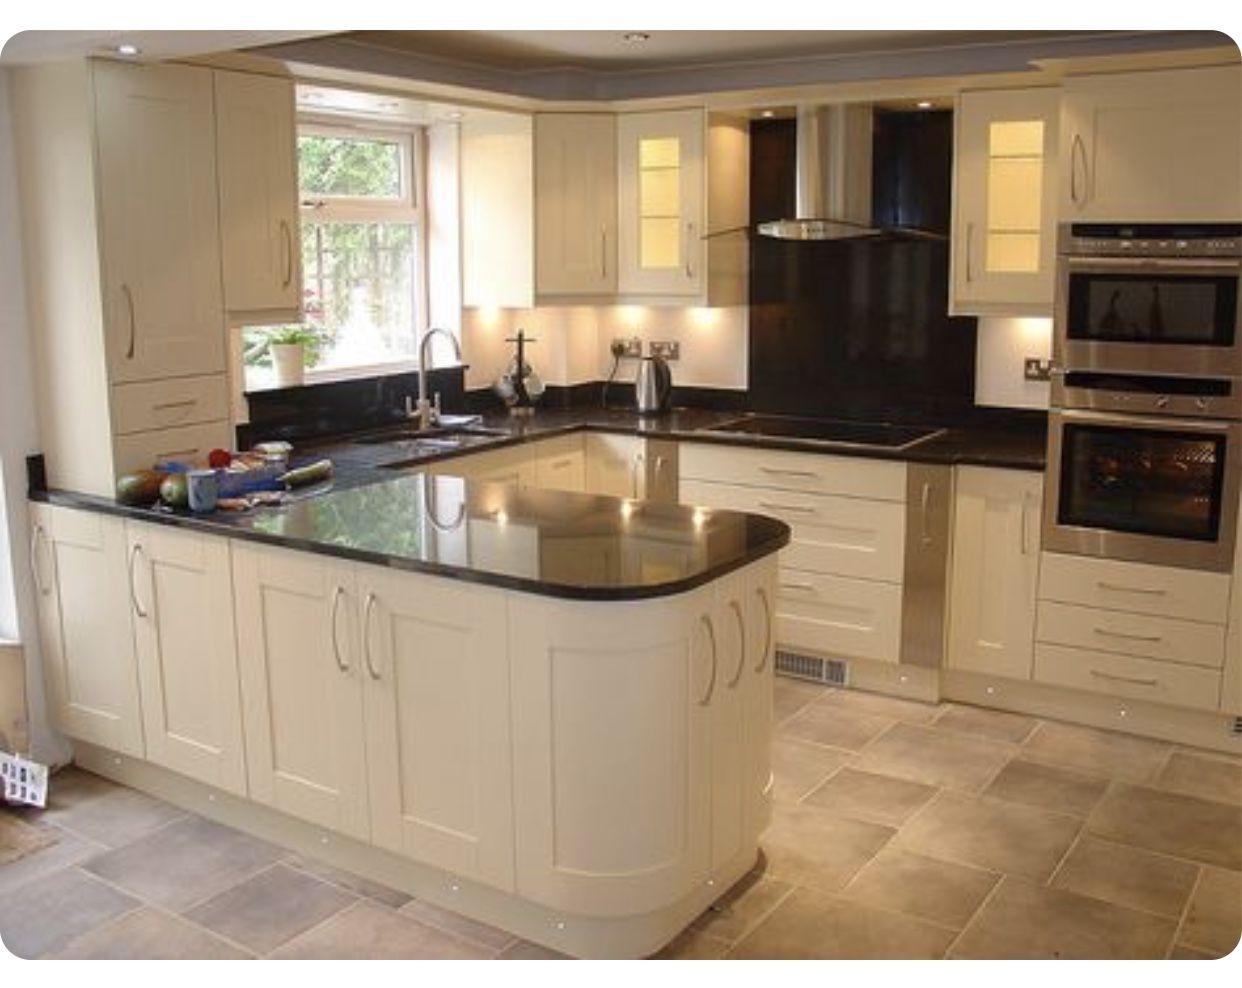 Pin By Chasethecat On Cream Kitchen Kitchen Layout Solid Wood Kitchens Solid Wood Kitchen Cabinets